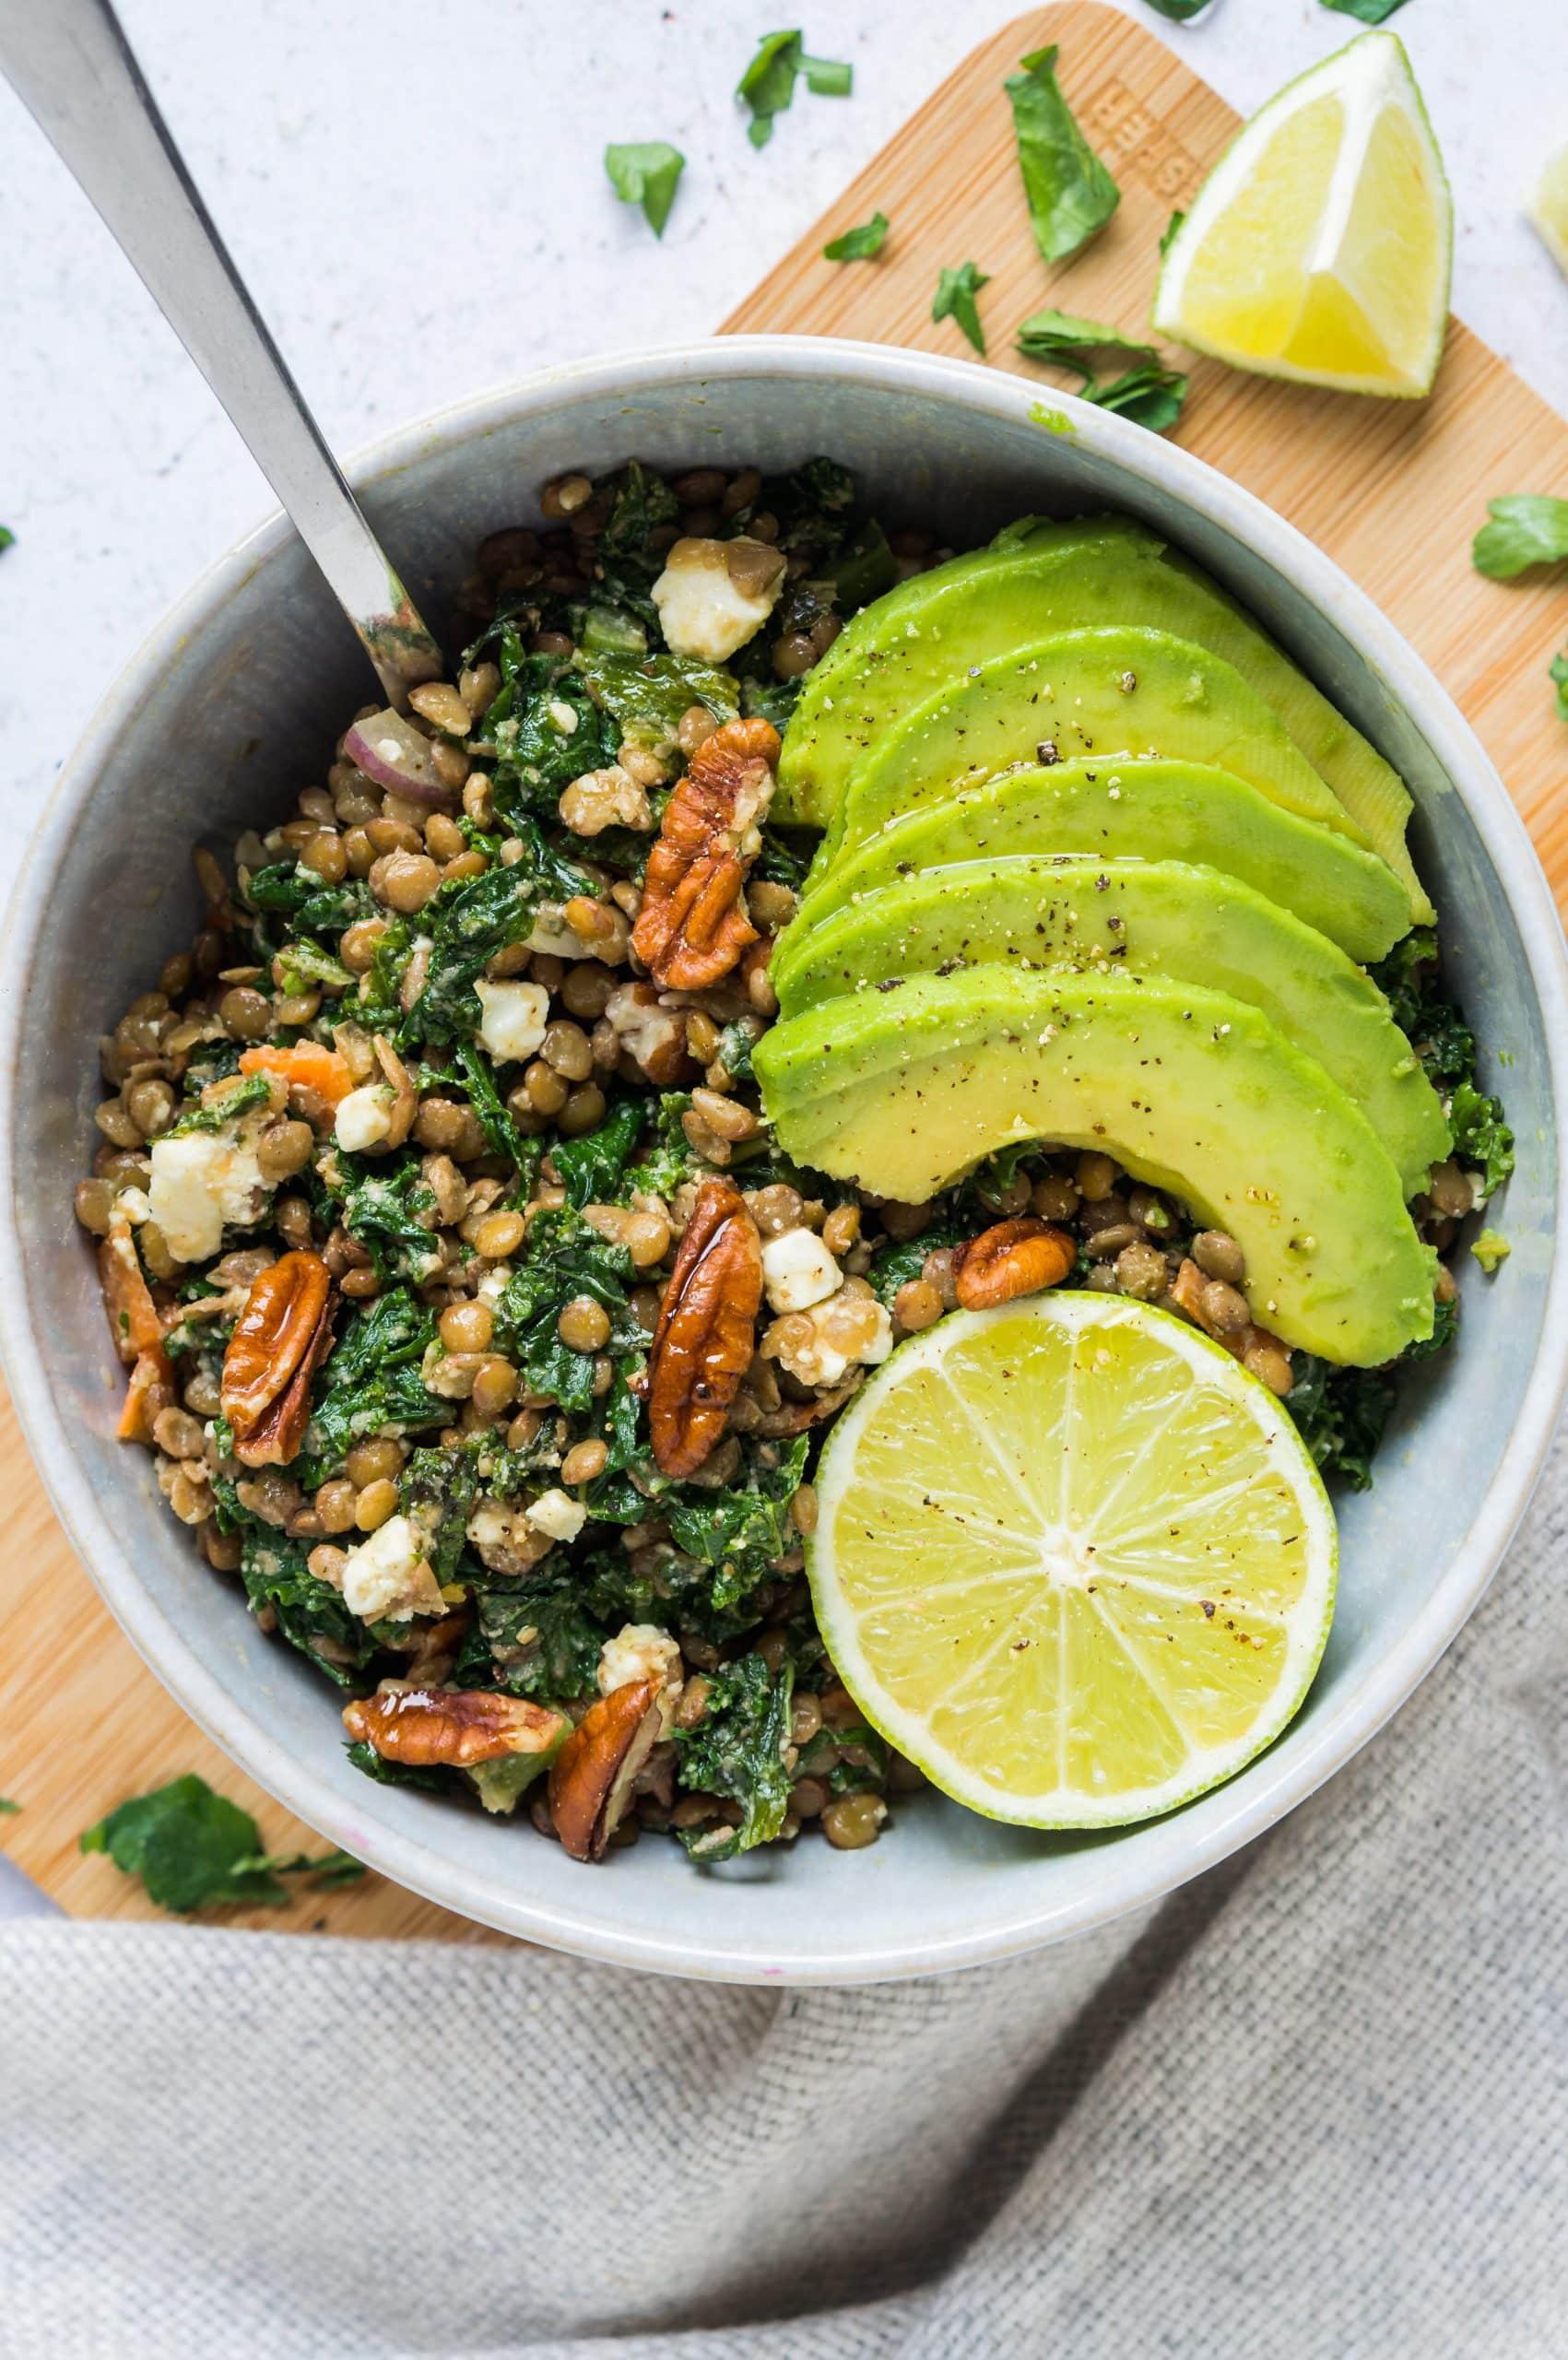 Lentils with Kale, Feta and Avocado